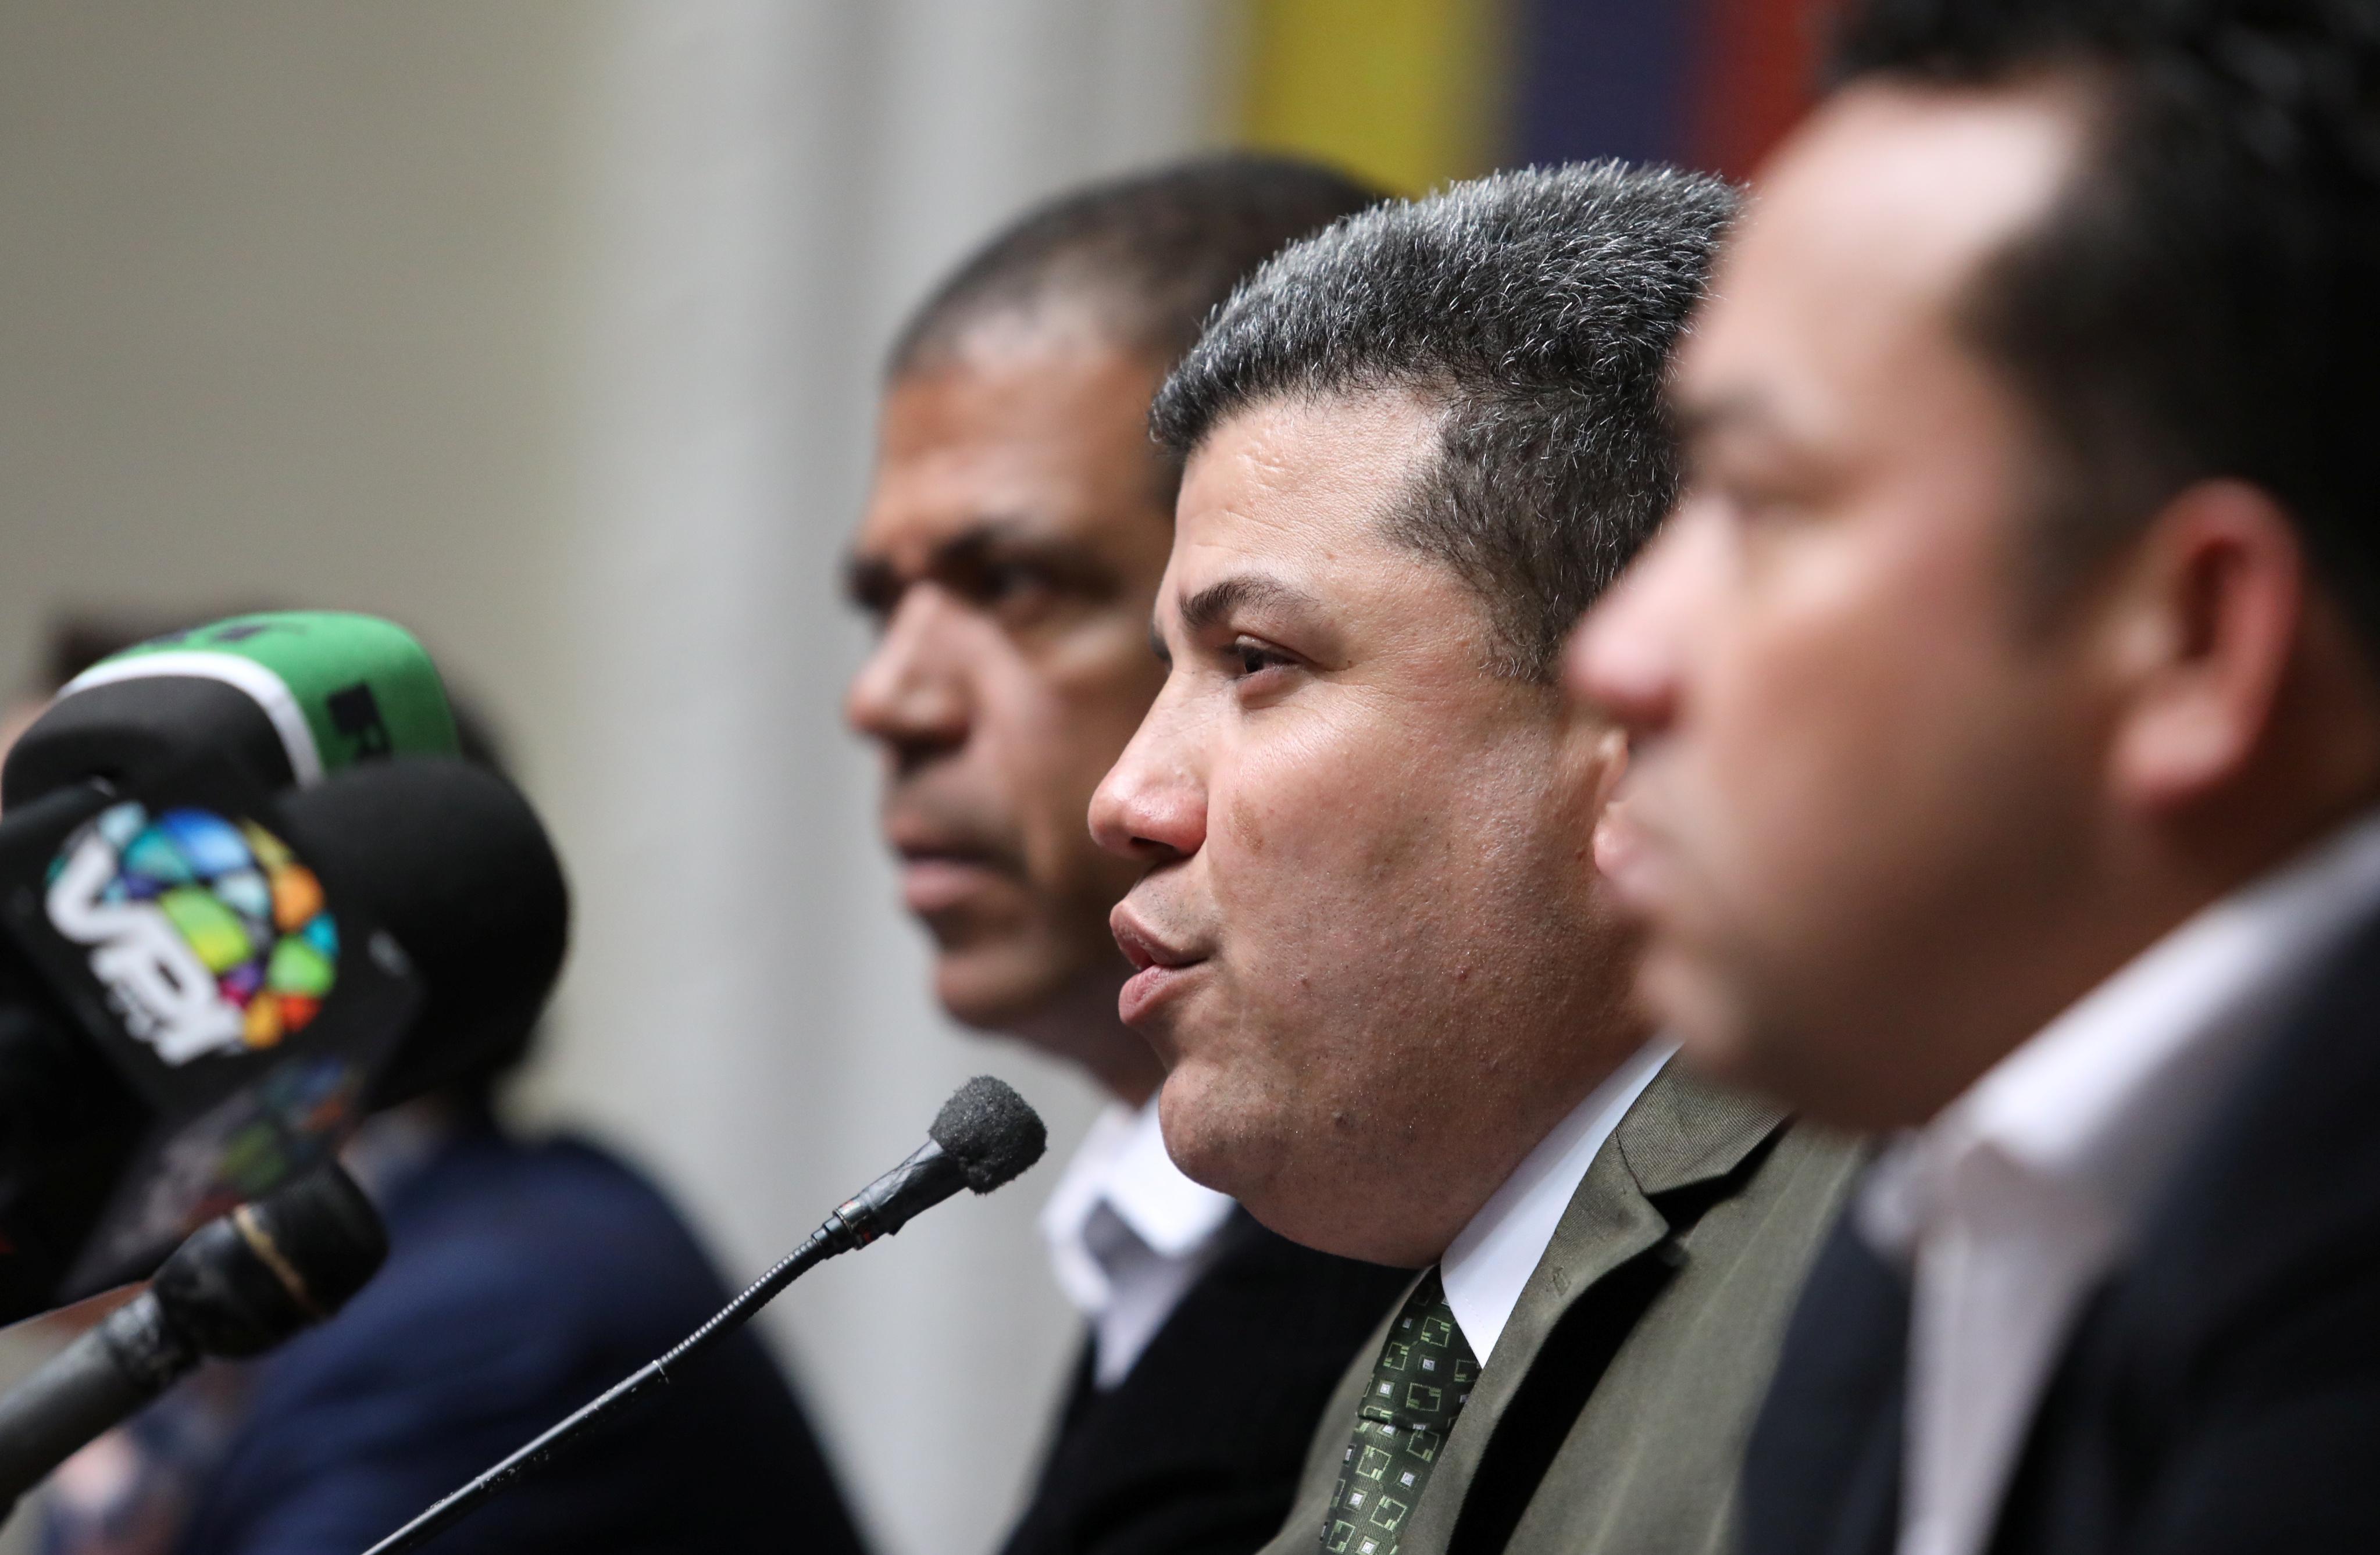 Exclusive: U.S. mulls sanctions against Venezuelan lawmakers over...